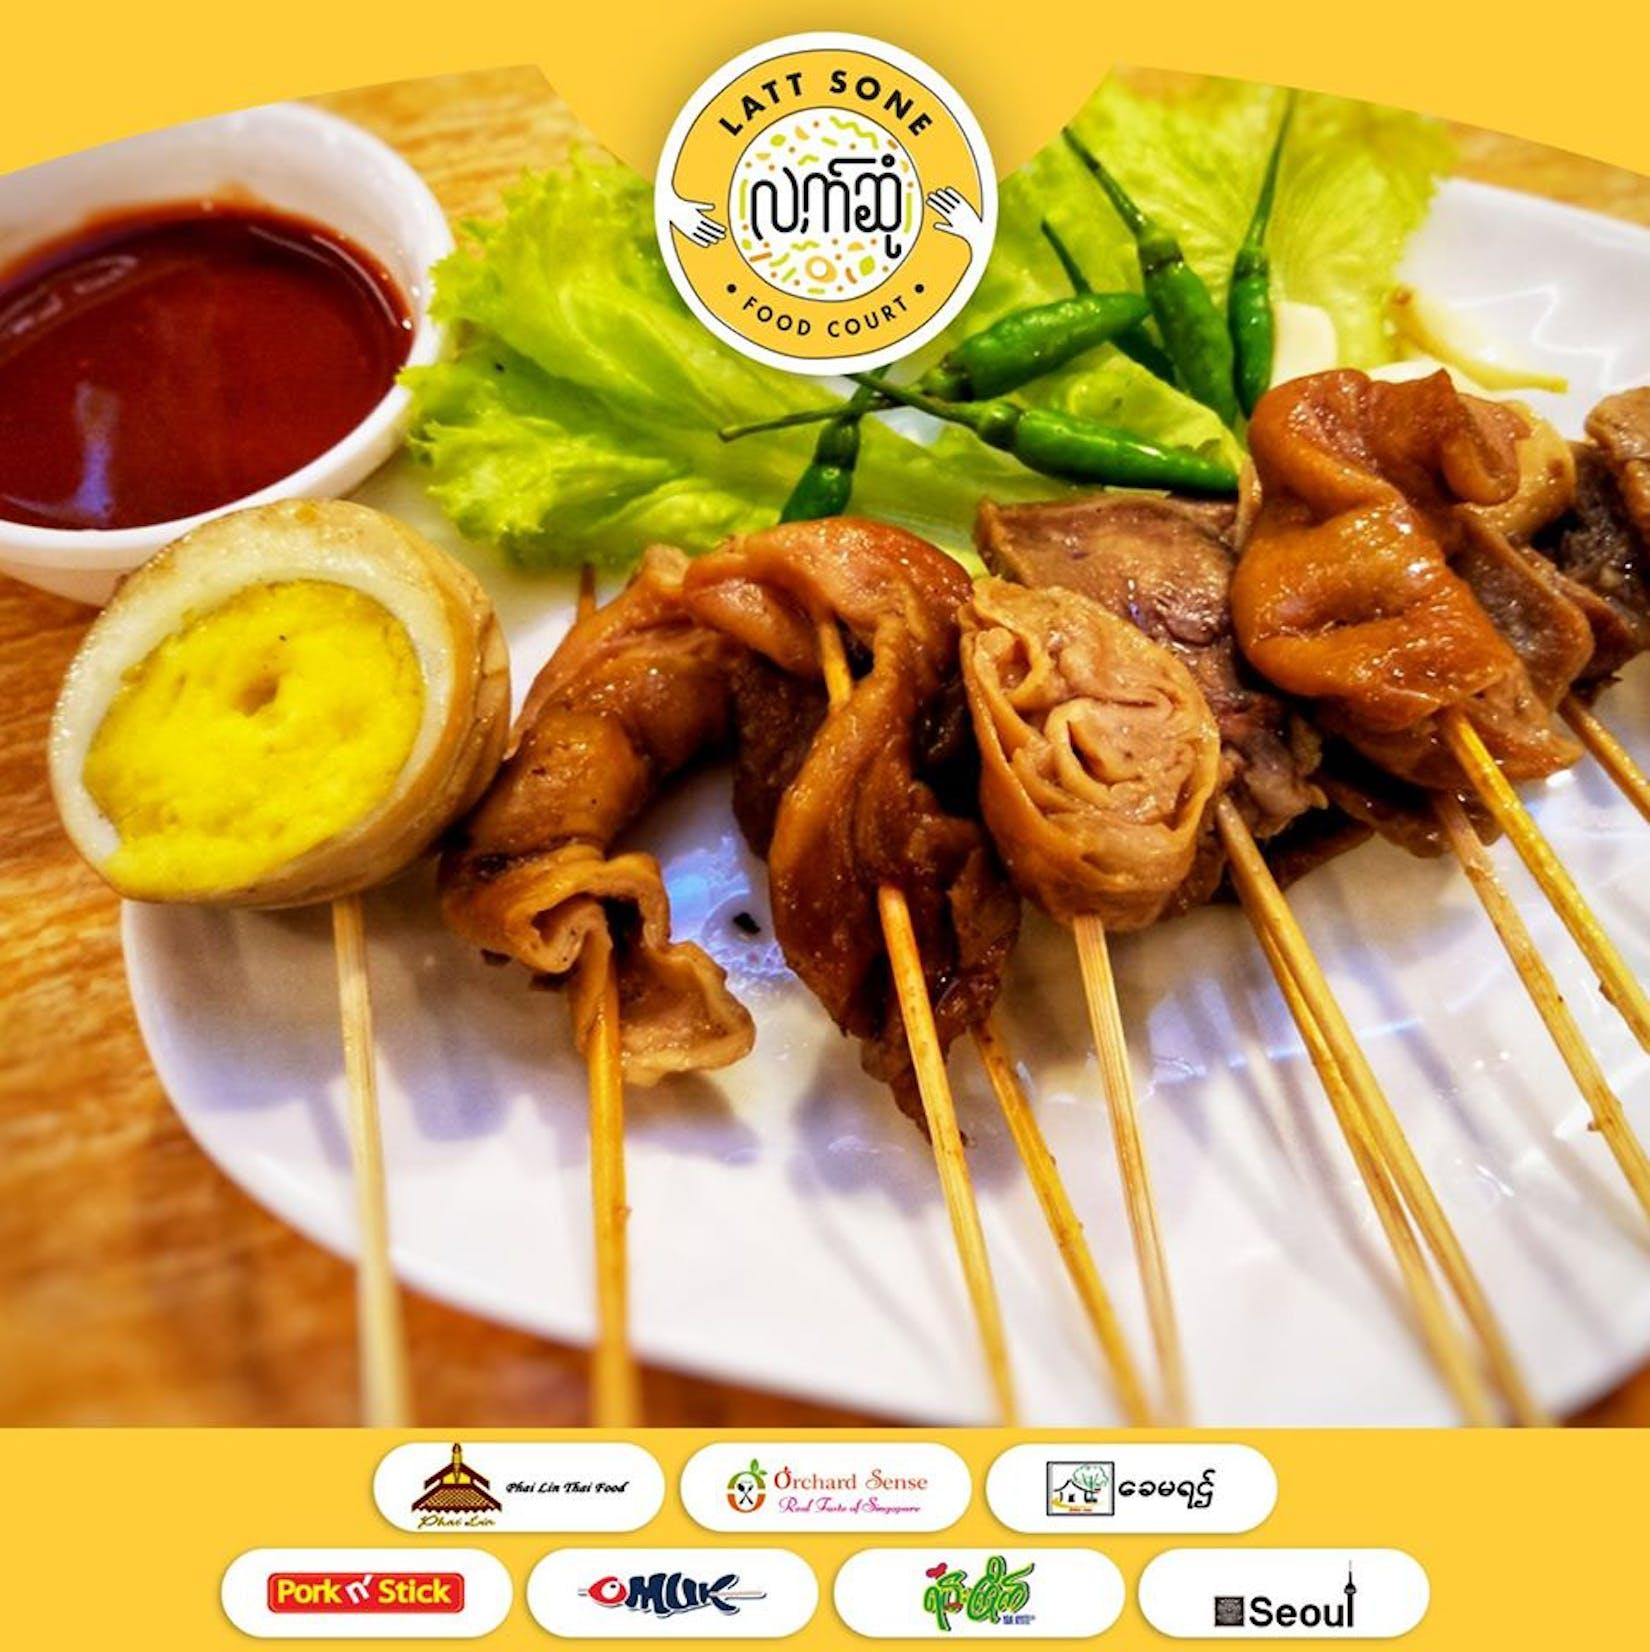 Latt Sone - Food Court | yathar